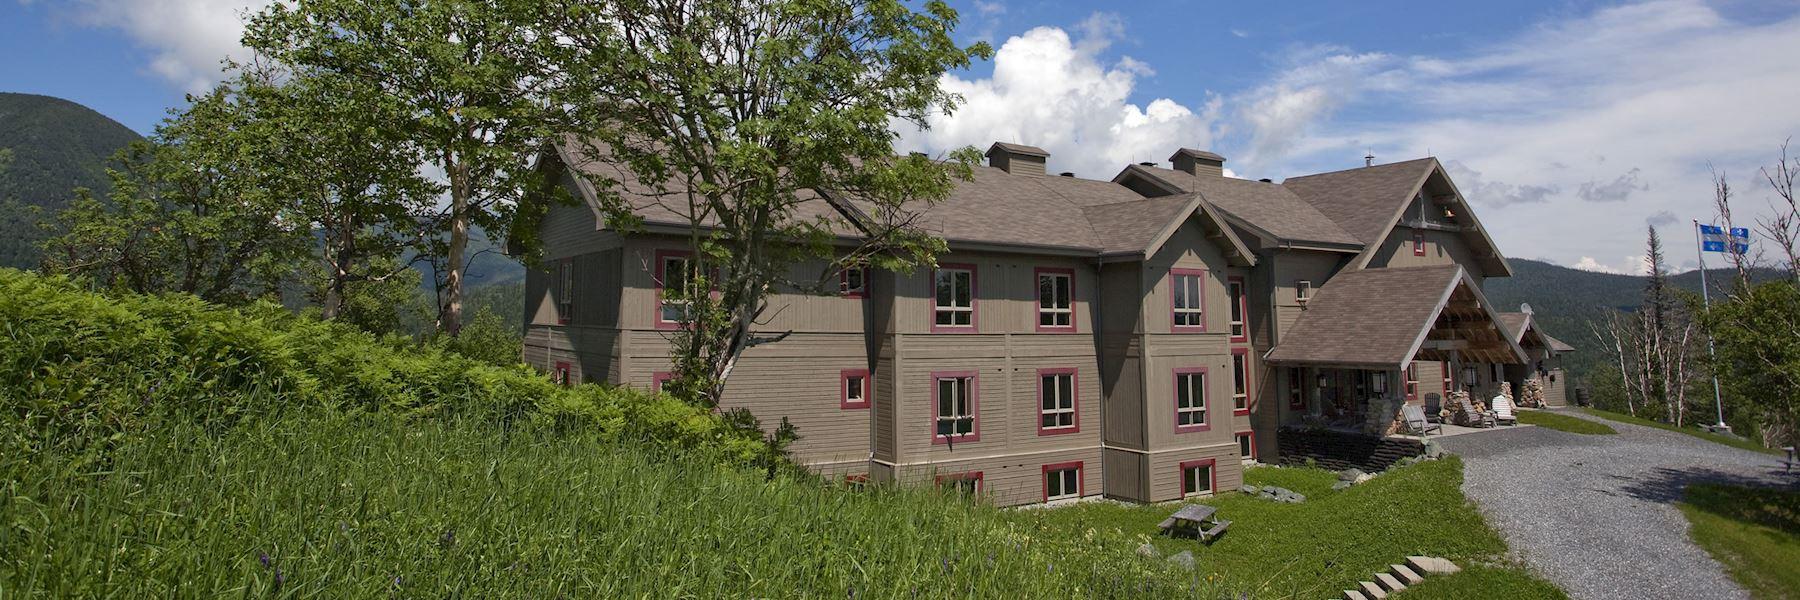 Chic Chocs Mountain Lodge